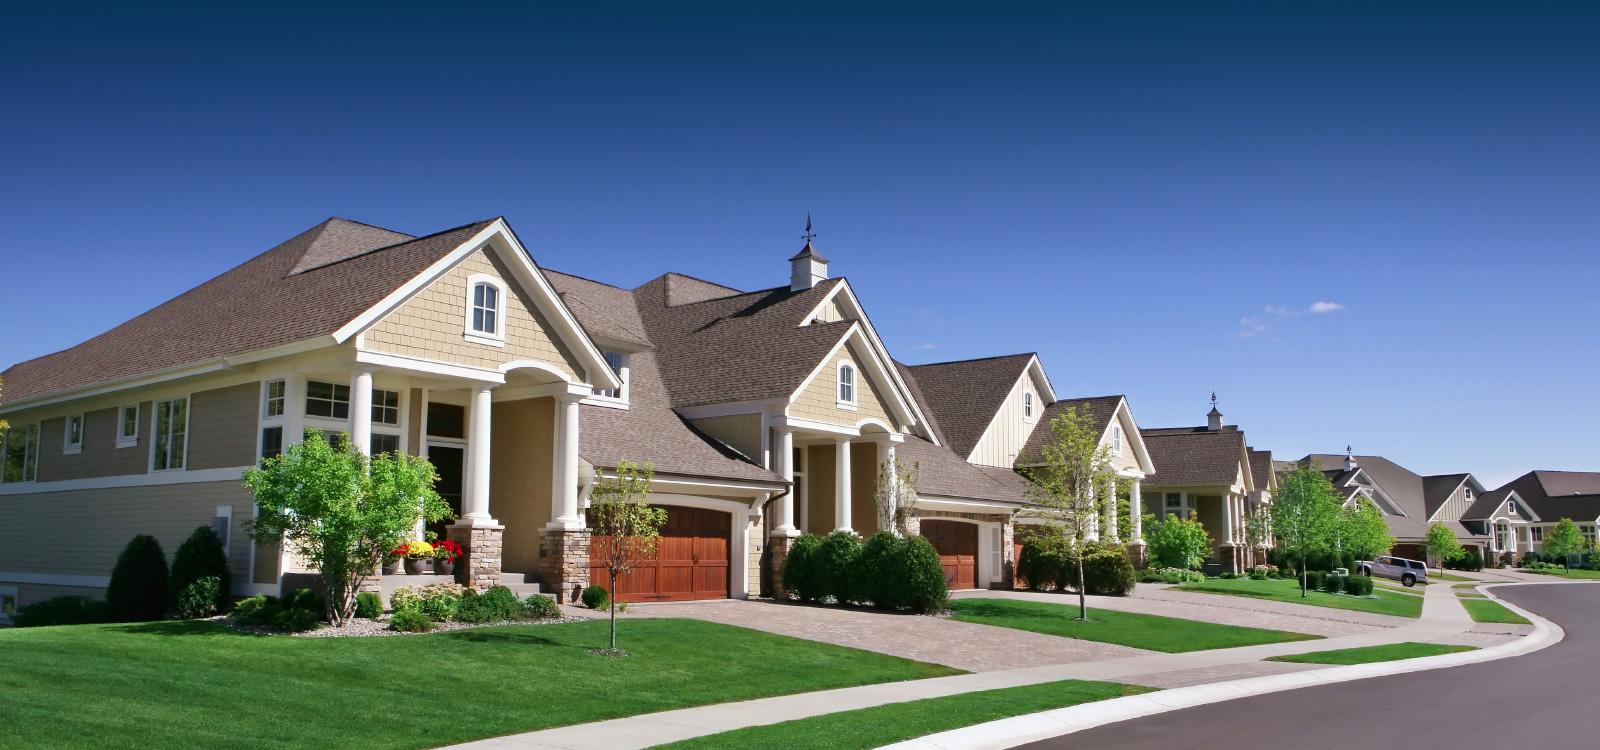 Home Inspection Checklist Jacksonville